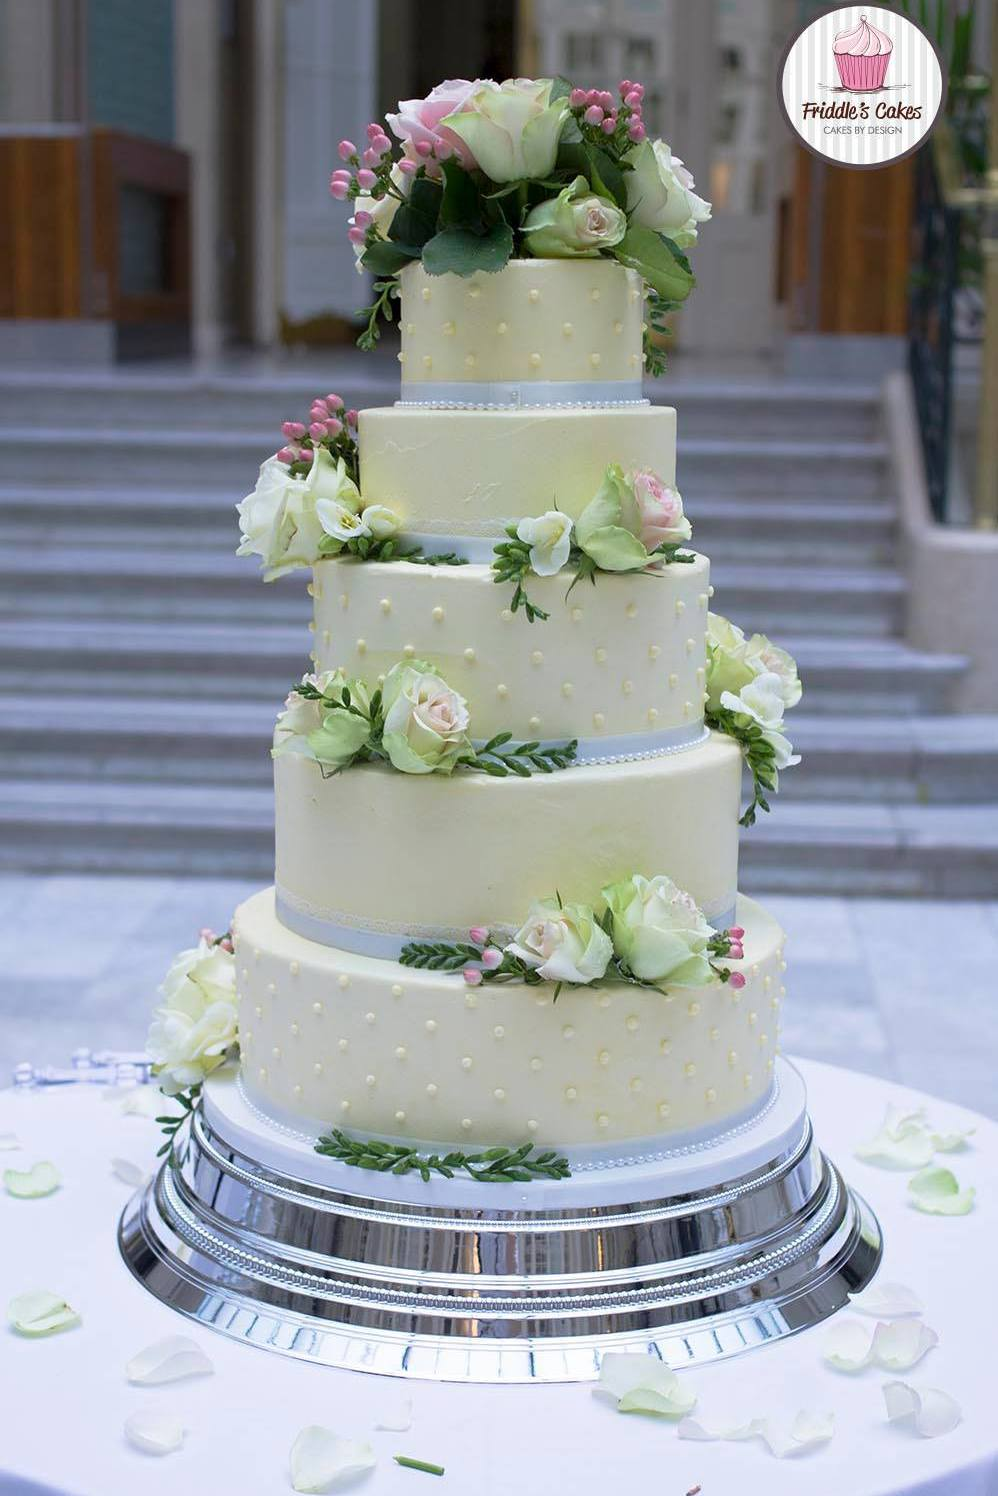 Napier Cake Stand Wedding Cake Stand Birthday Cake Stand Cakestand